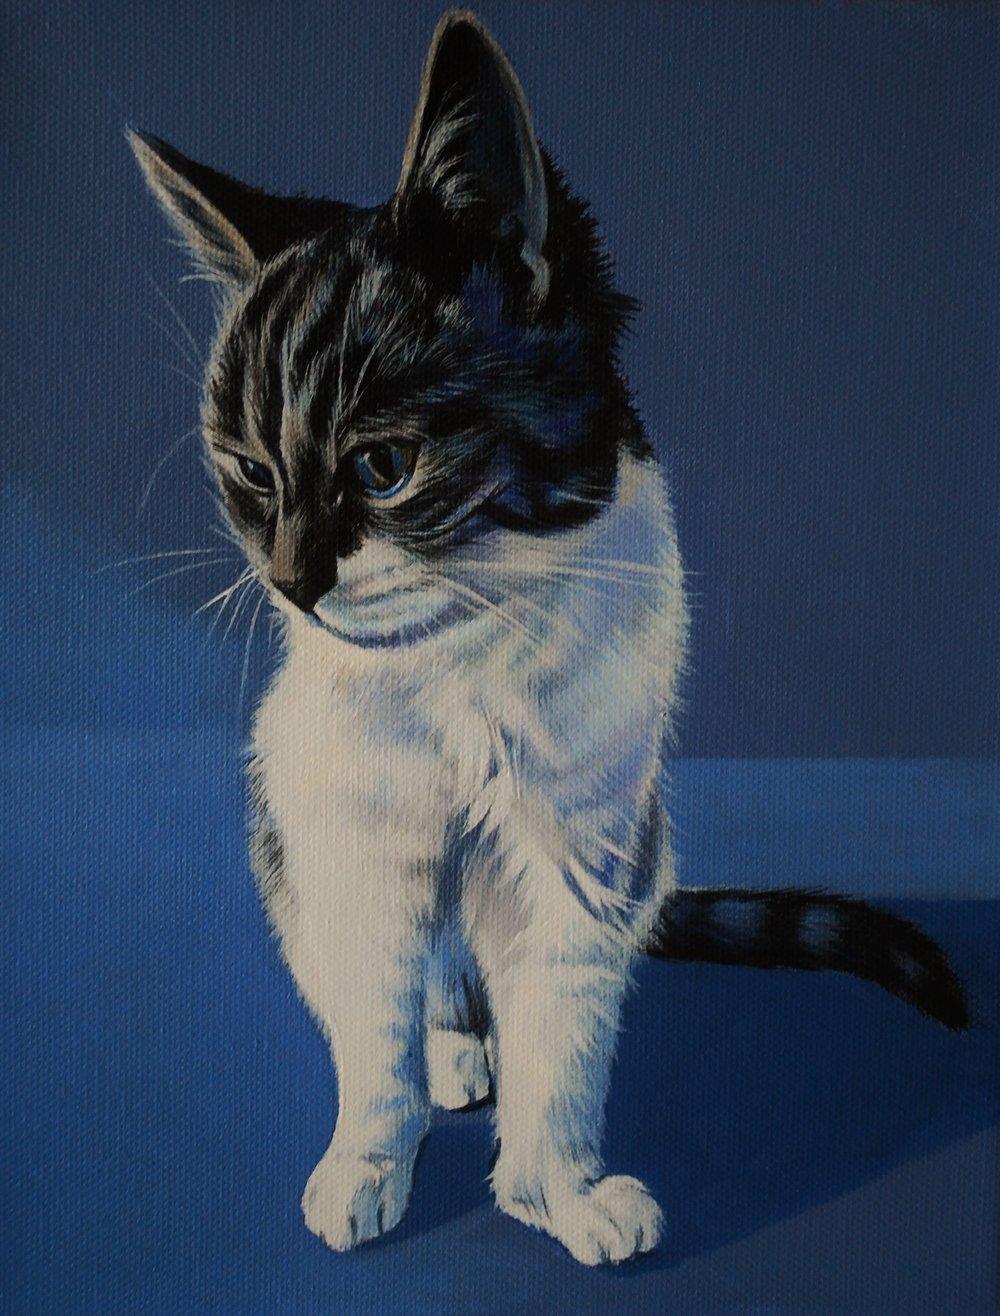 Kitty_final painting.JPG